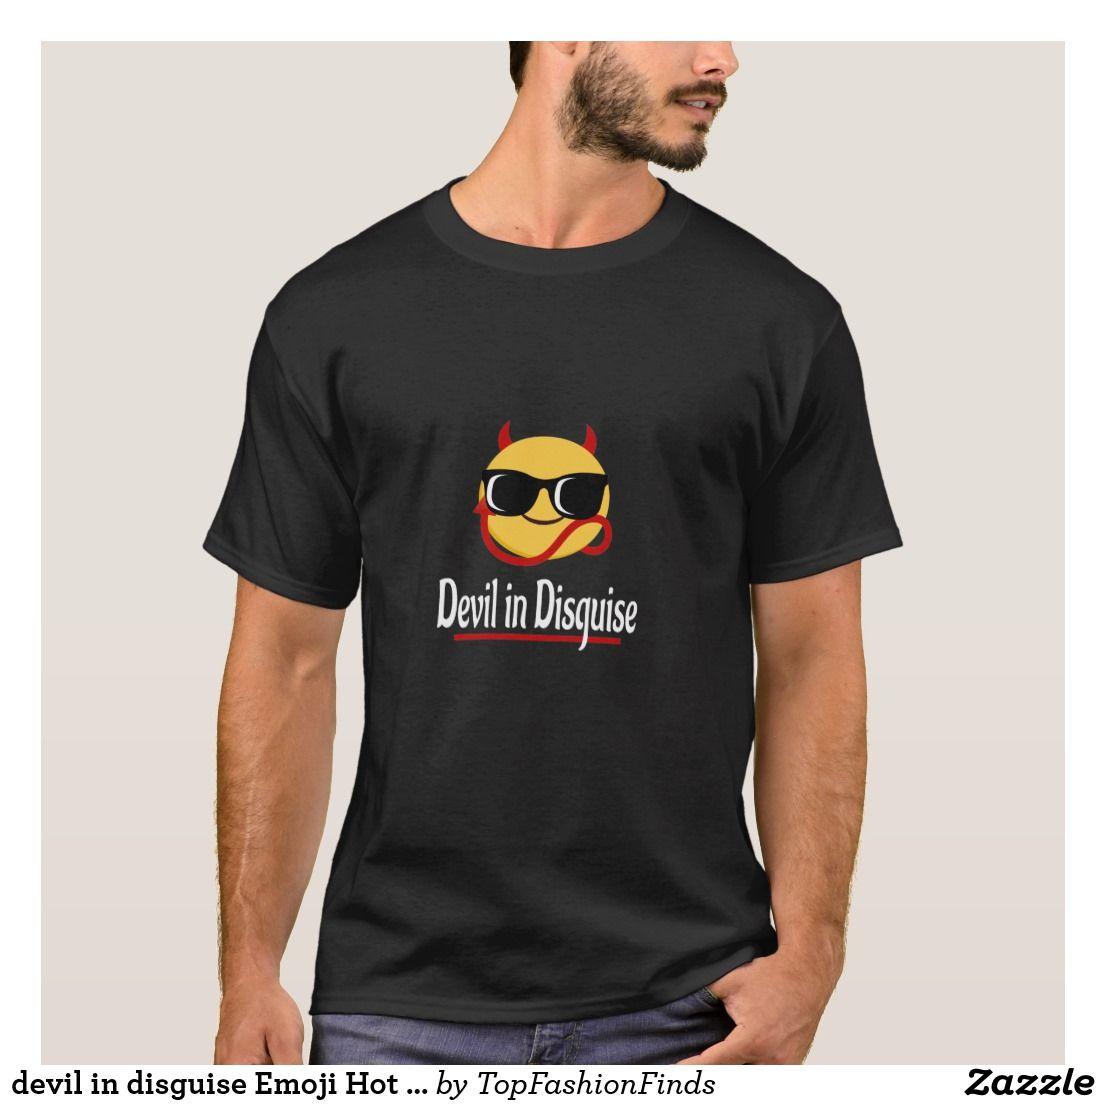 0bc791dc devil in disguise Emoji Hot Trendy Funny white T-Shirt | Zazzle.com ...